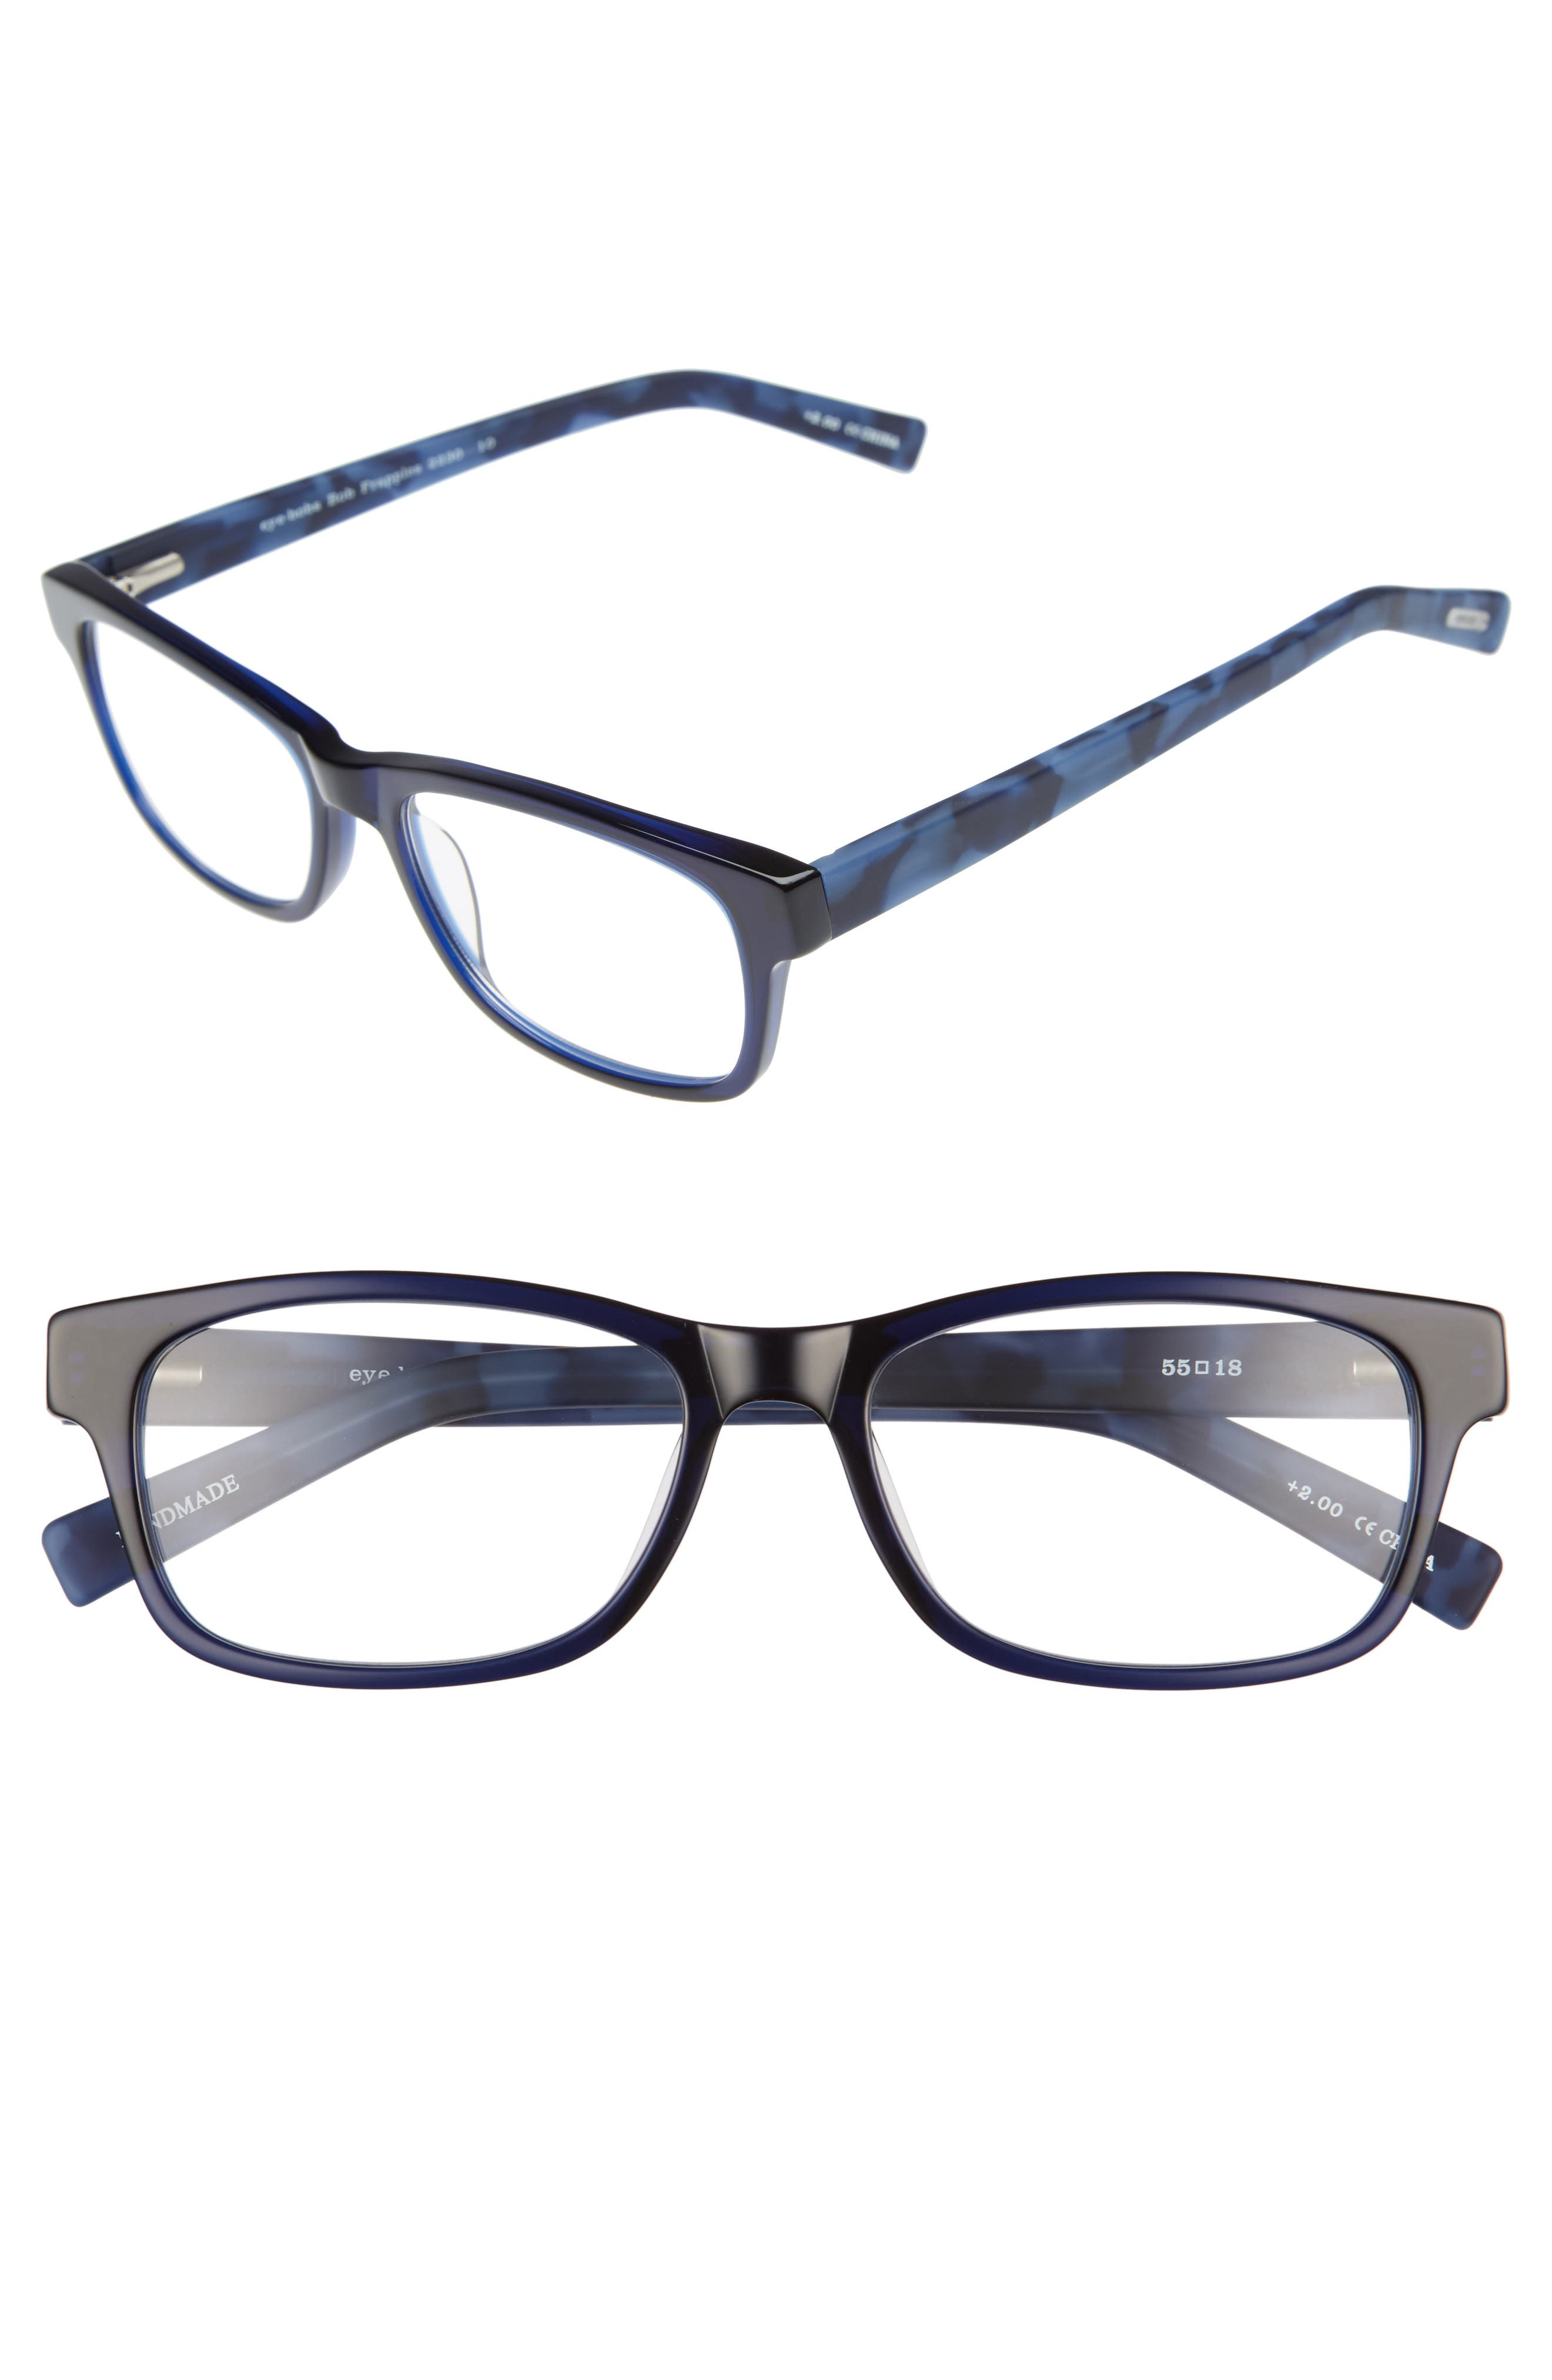 Eyebobs Bob Frapples 55mm Reading Glasses